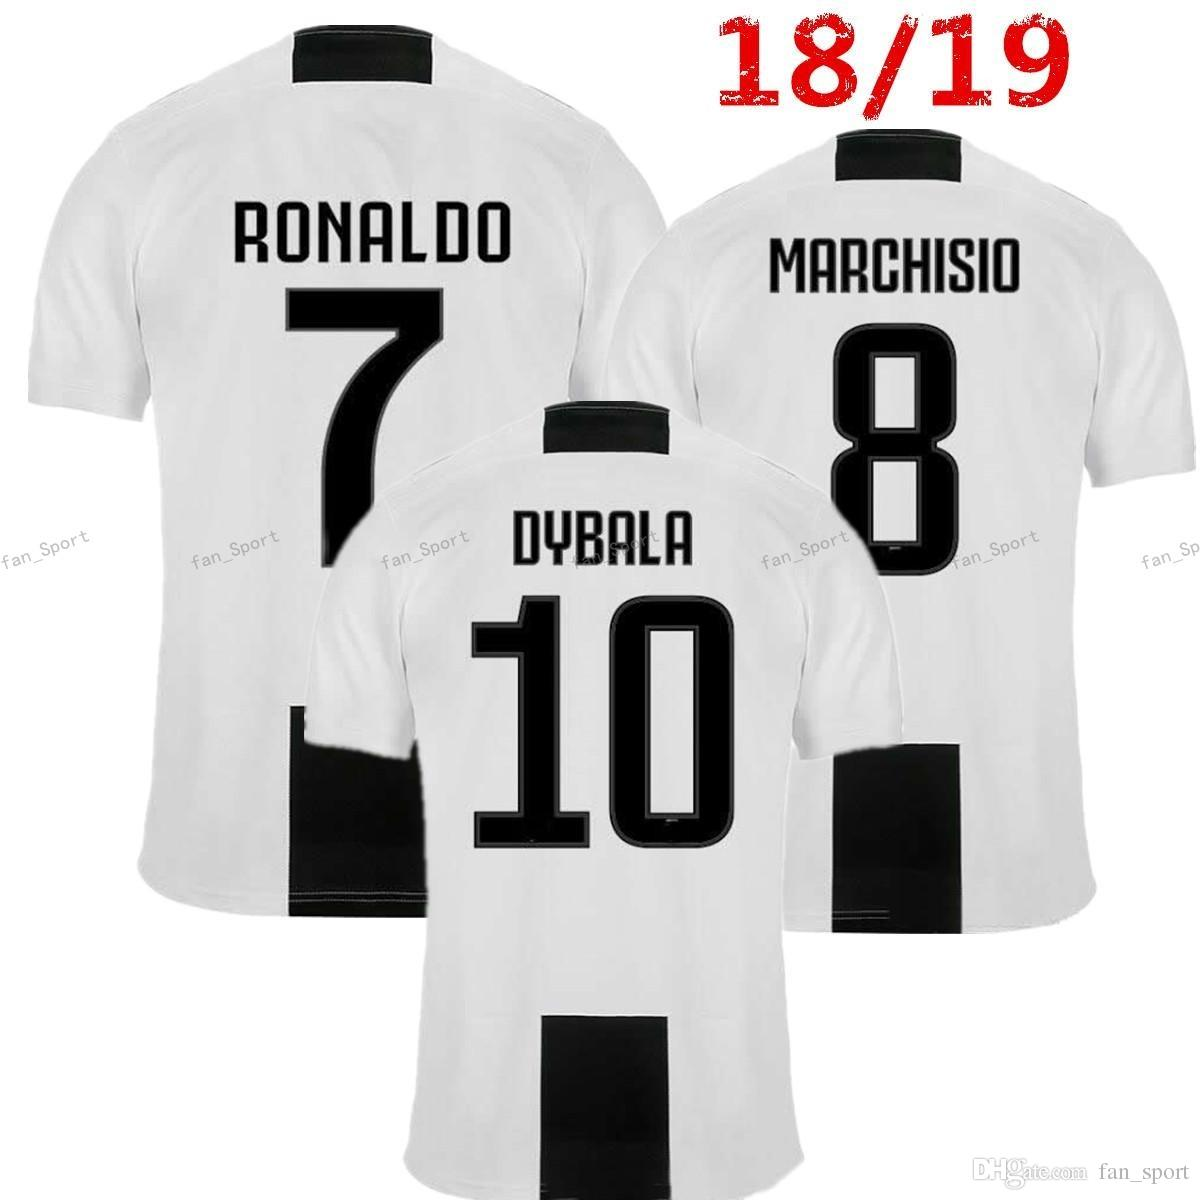 84765ae62 2019 2018 Juventus Soccer Jerseys Dybala 7 Ronaldo 18 19 HIGUAIN MATUIDI  MANDZUKIC Buffon MARCHISIO Goalkeeper Men Kids Women Football Shirts From  Fan sport ...